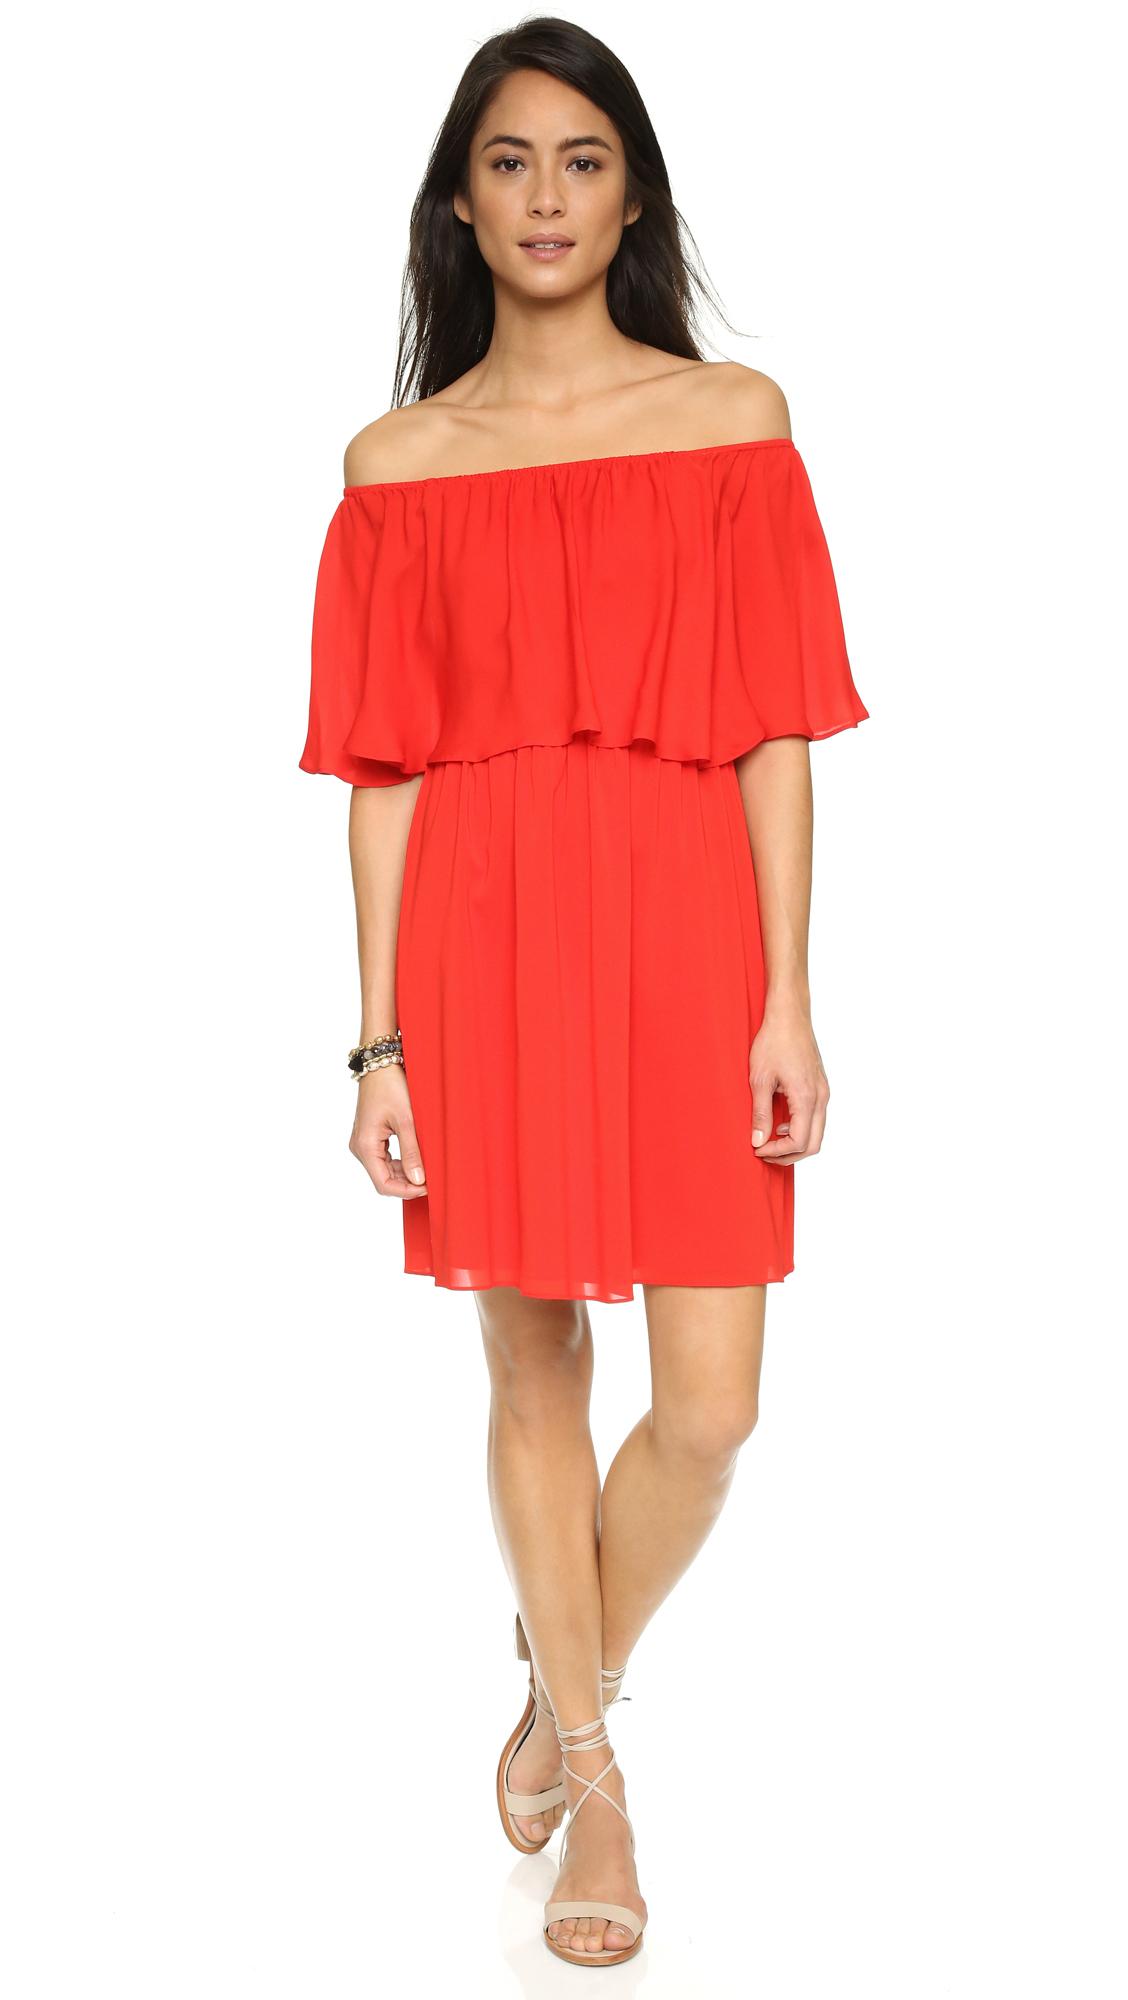 21a7c9fb2e5d Lyst - Alice + Olivia Shari Off Shoulder Dress in Red